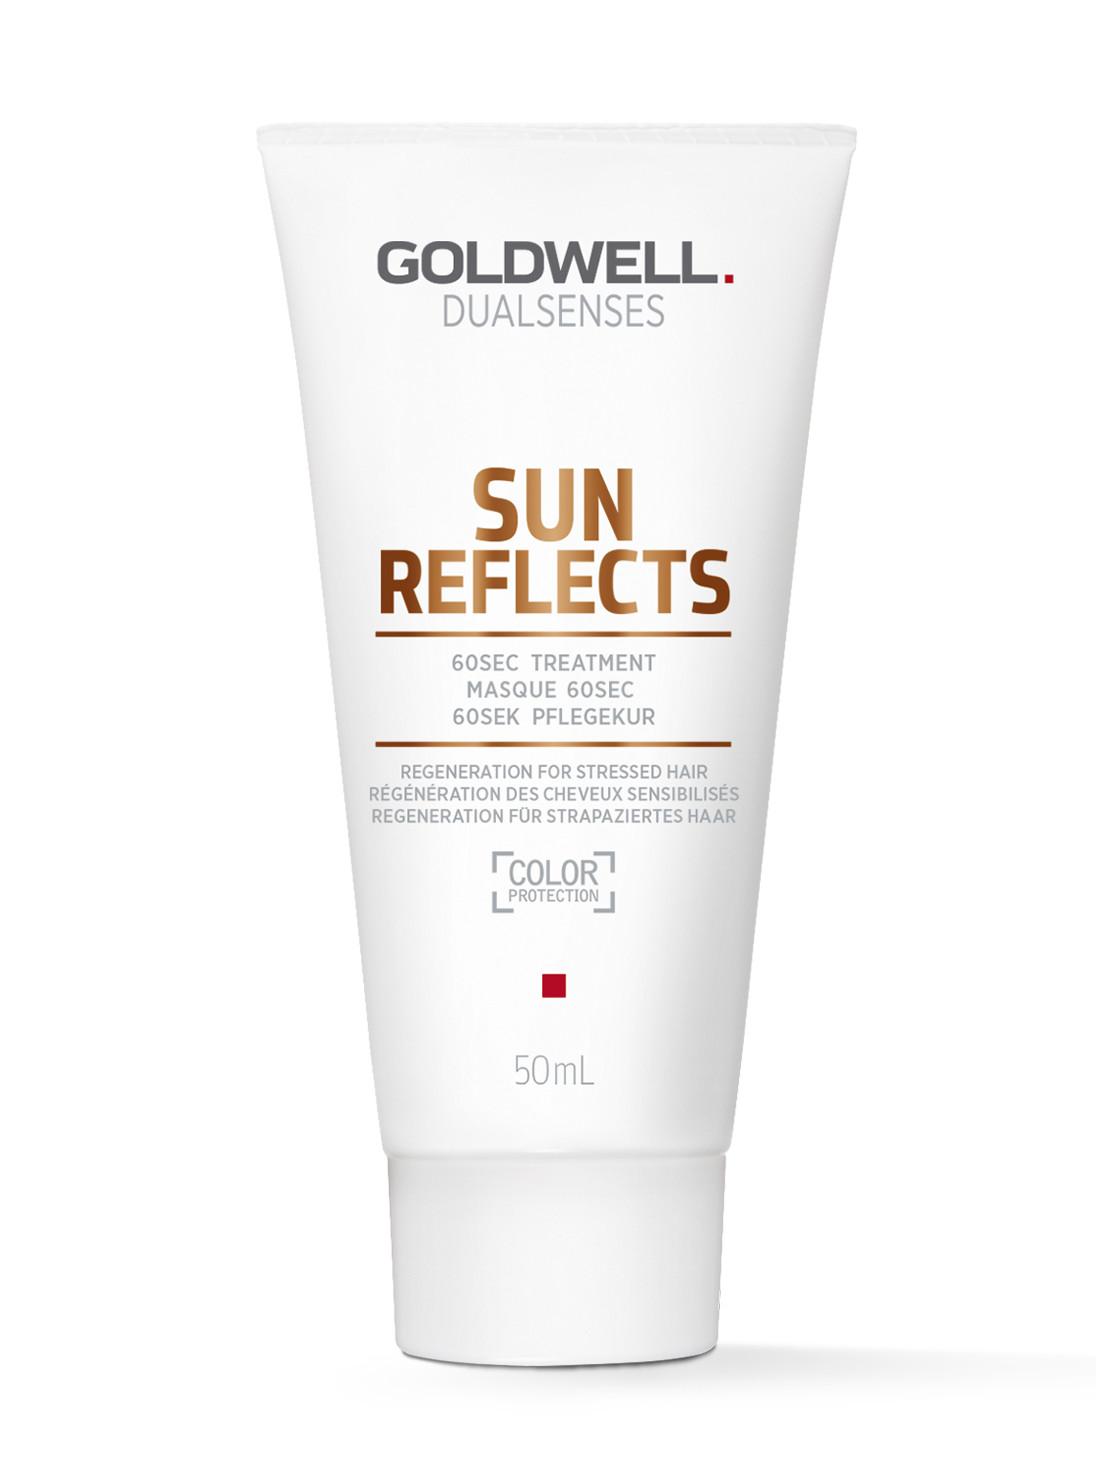 Maska na vlasy vystavené slunci Goldwell Sun Reflects - 50 ml (206189)